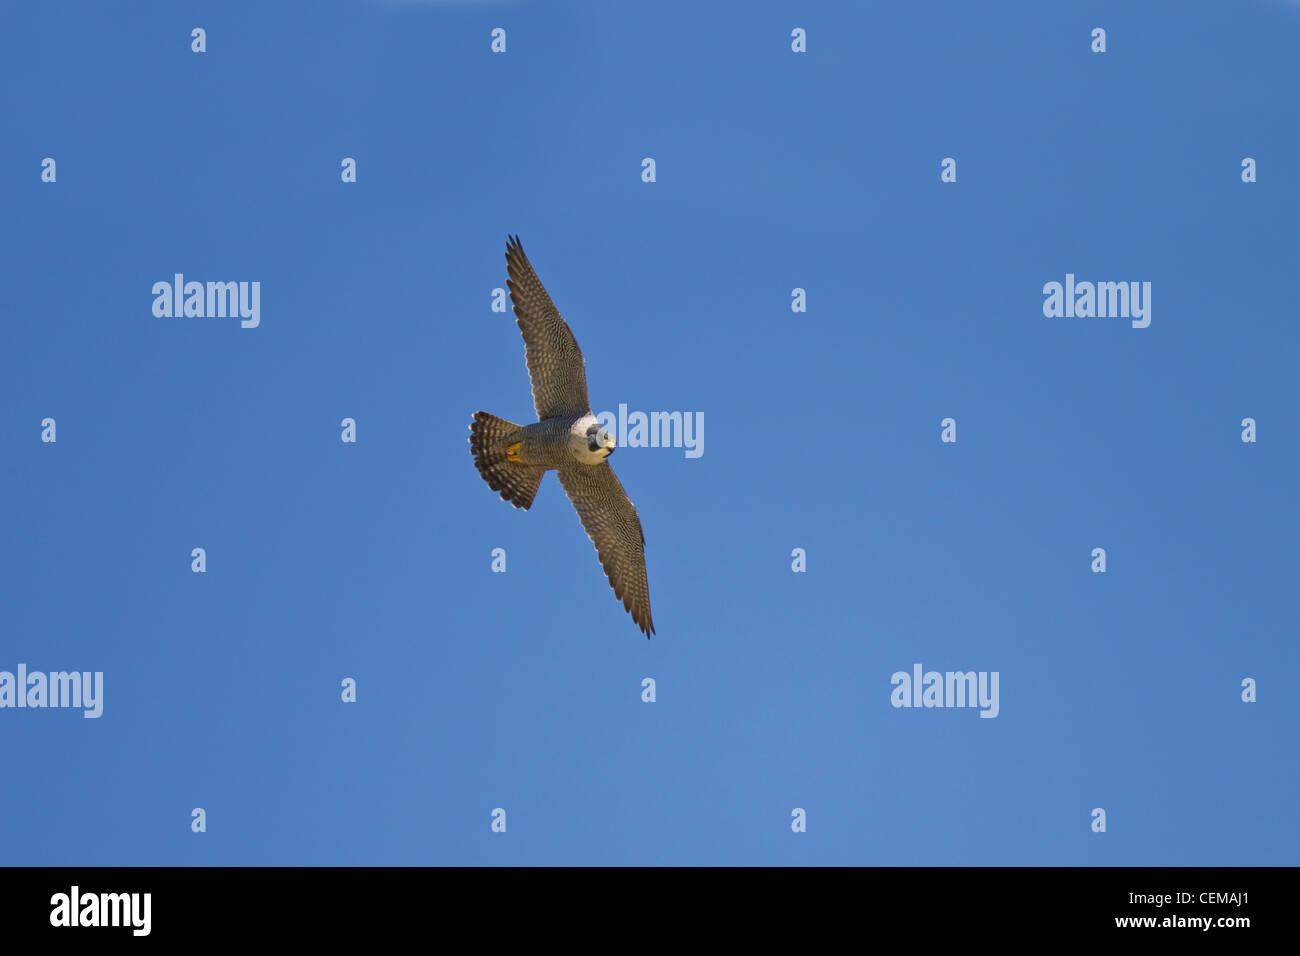 Wanderfalke, Falco peregrinus, peregrine falcon - Stock Image